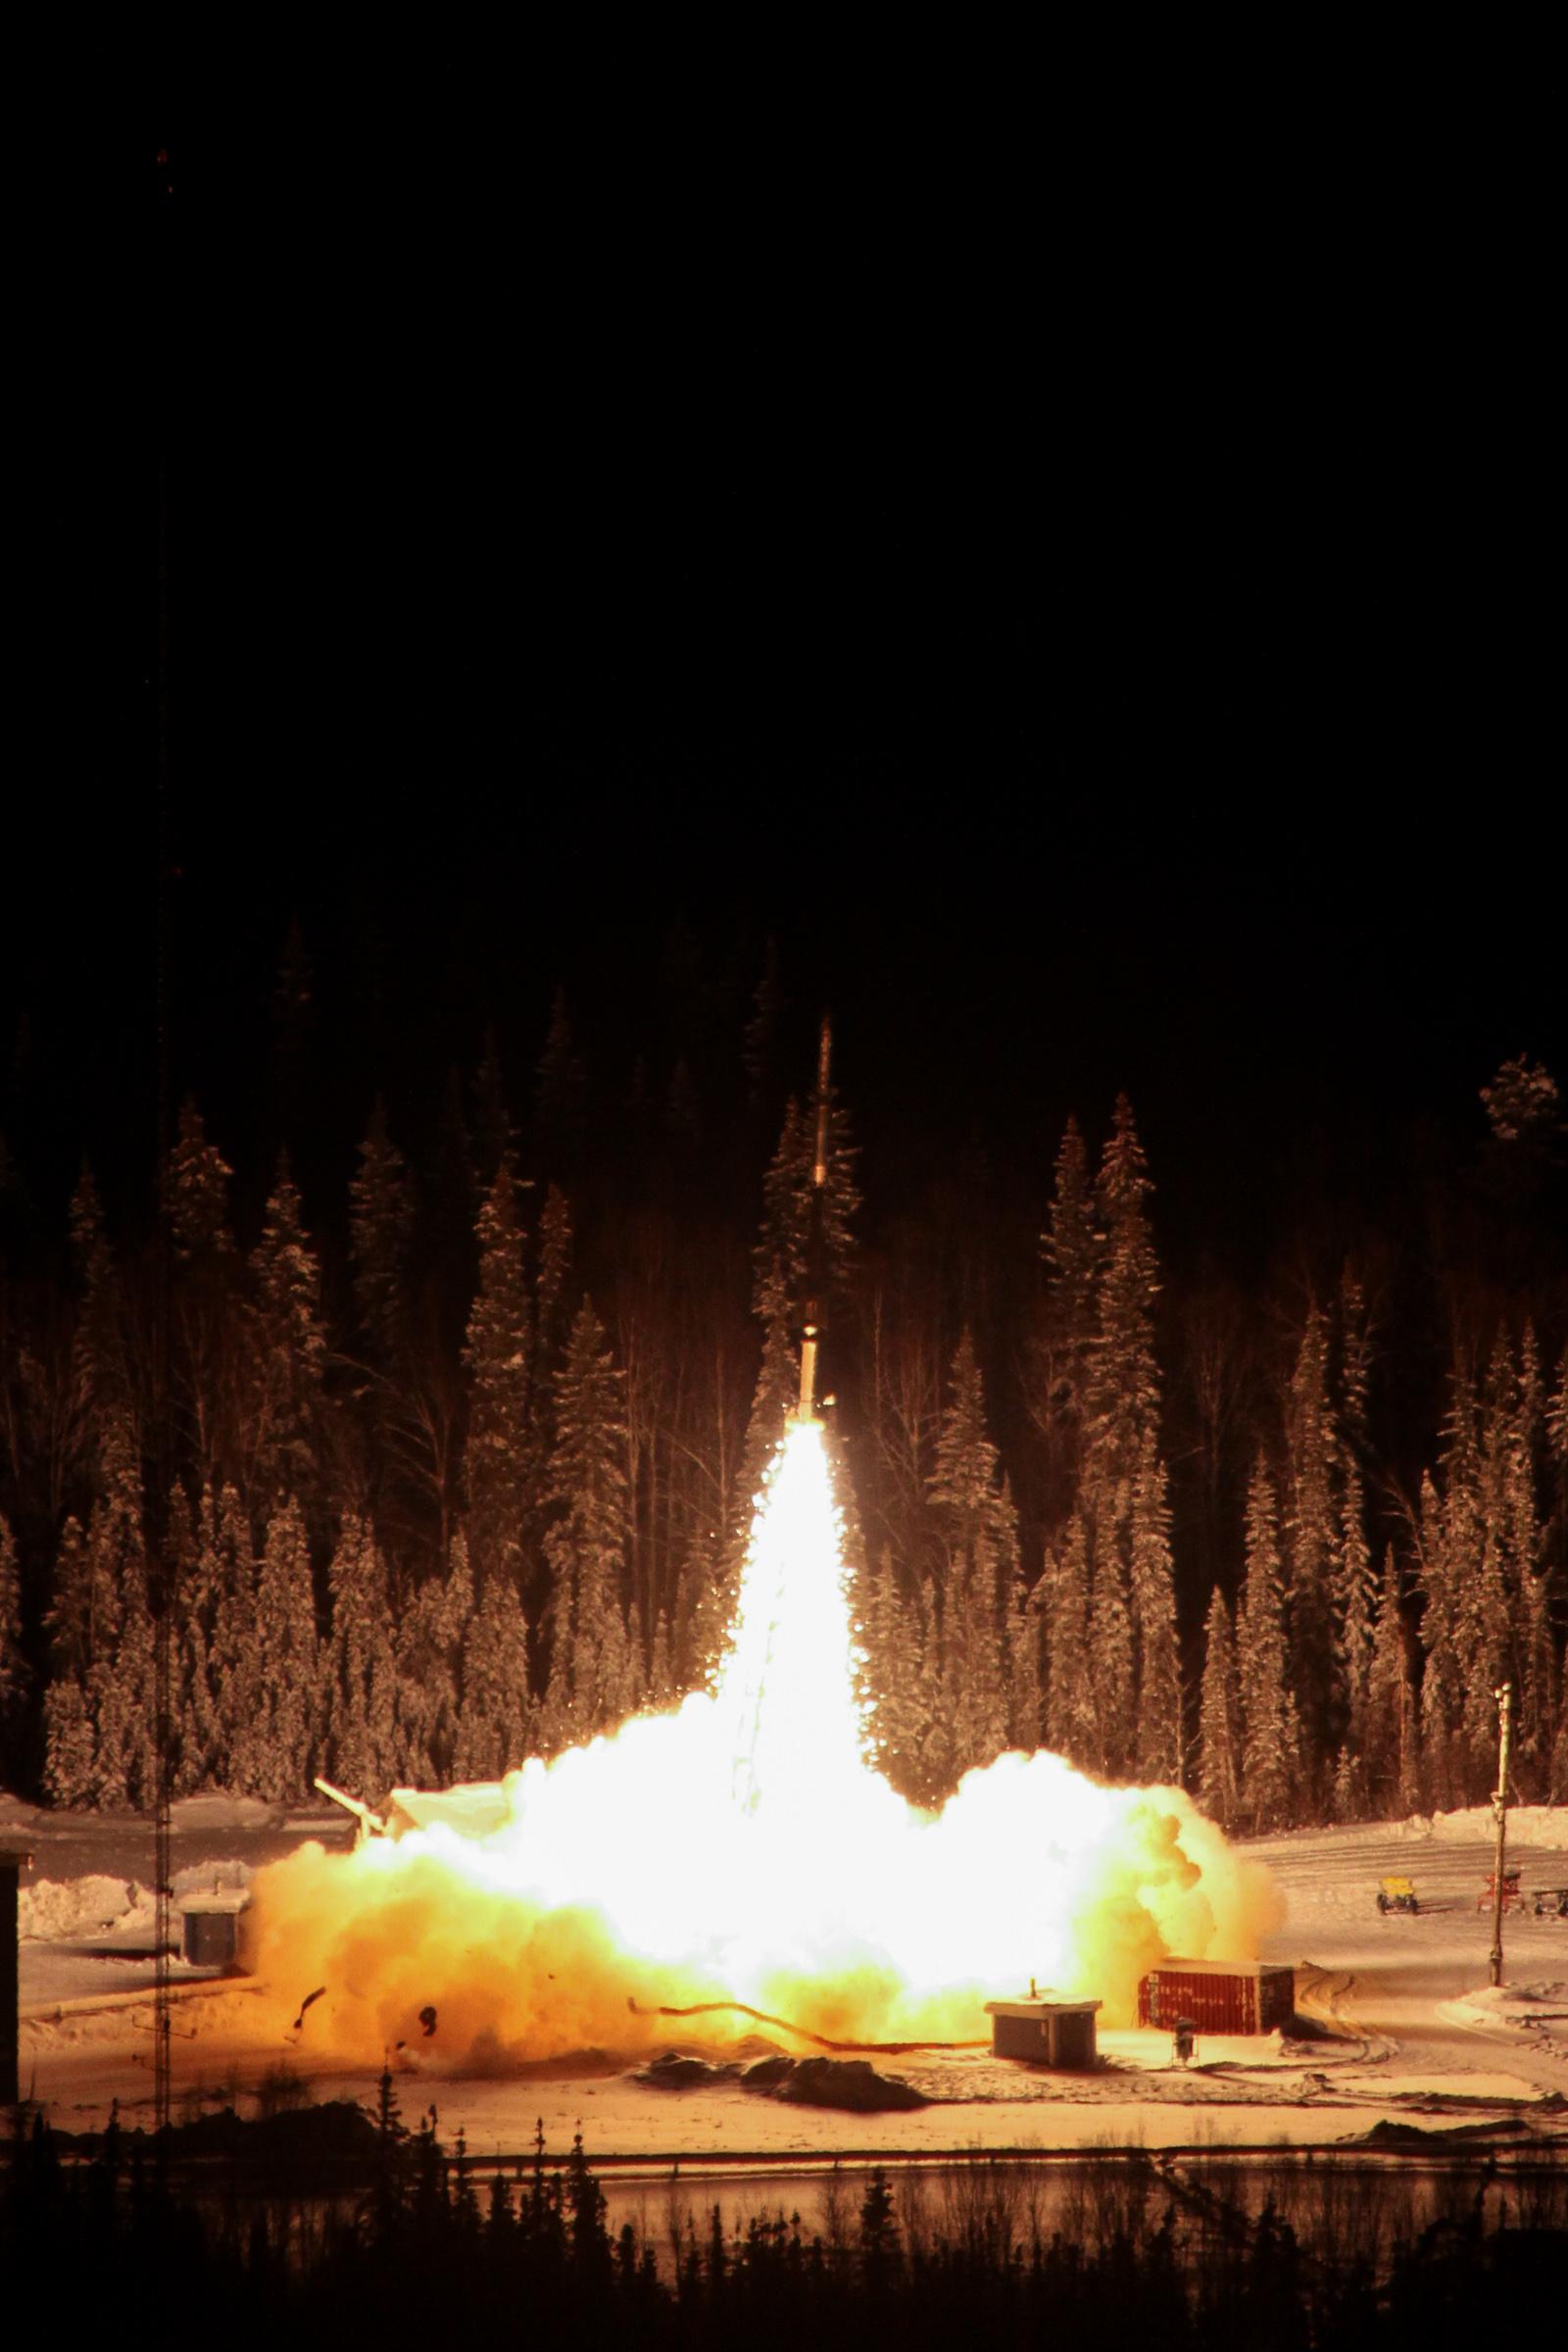 Aurora Experiment Streaks Into Alaska's Sky on Small NASA Rocket (Photos)